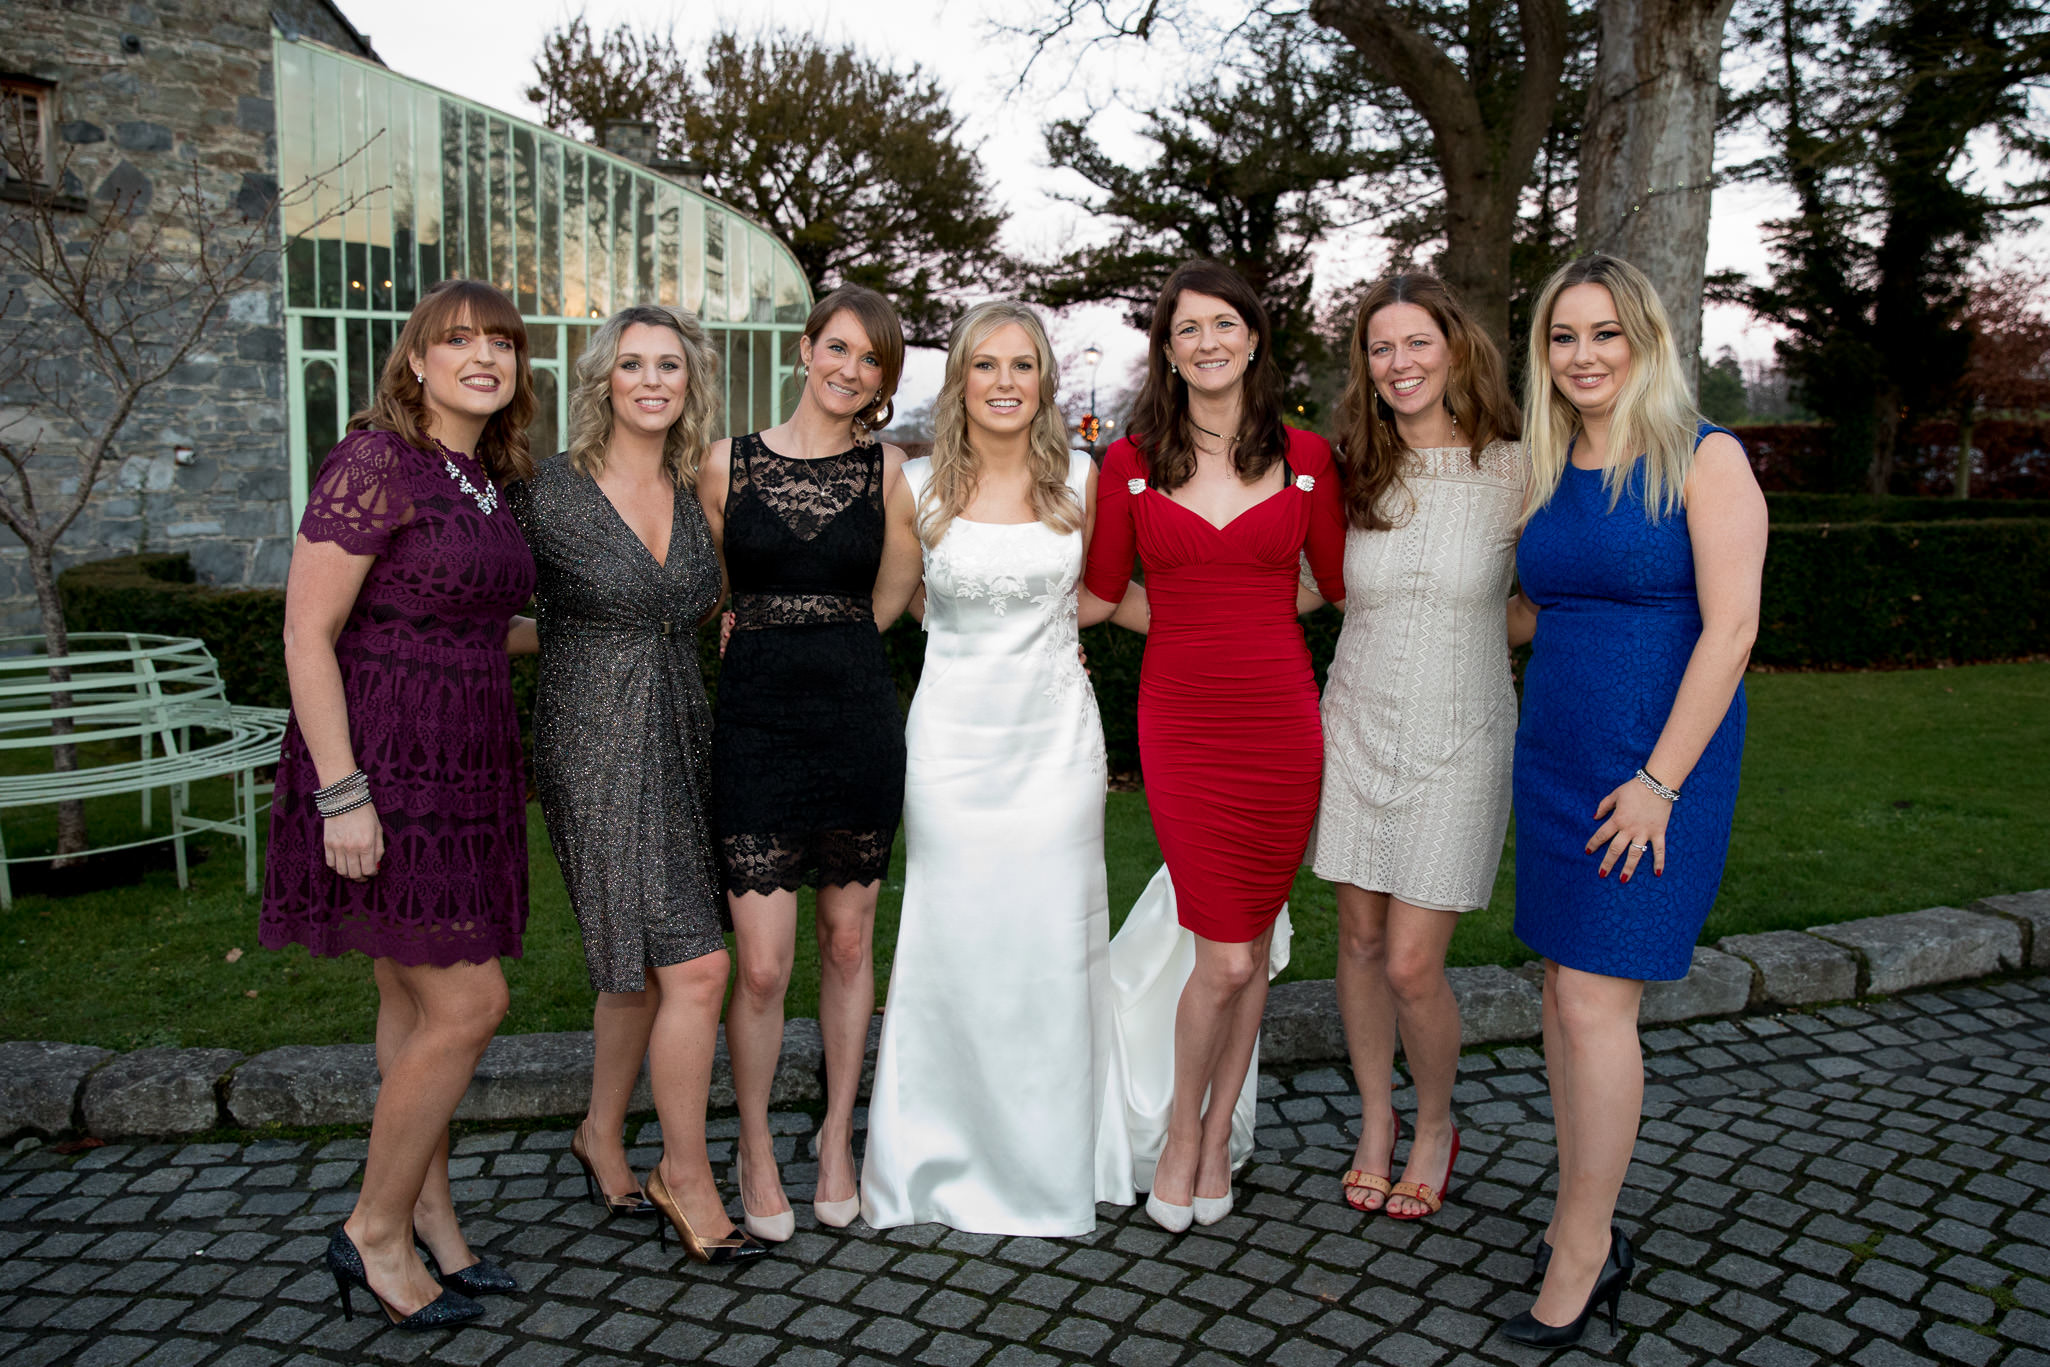 clairebyrnephotography-wedding-cliff-lyons-sparklers-christmas-clara-john-17.jpg